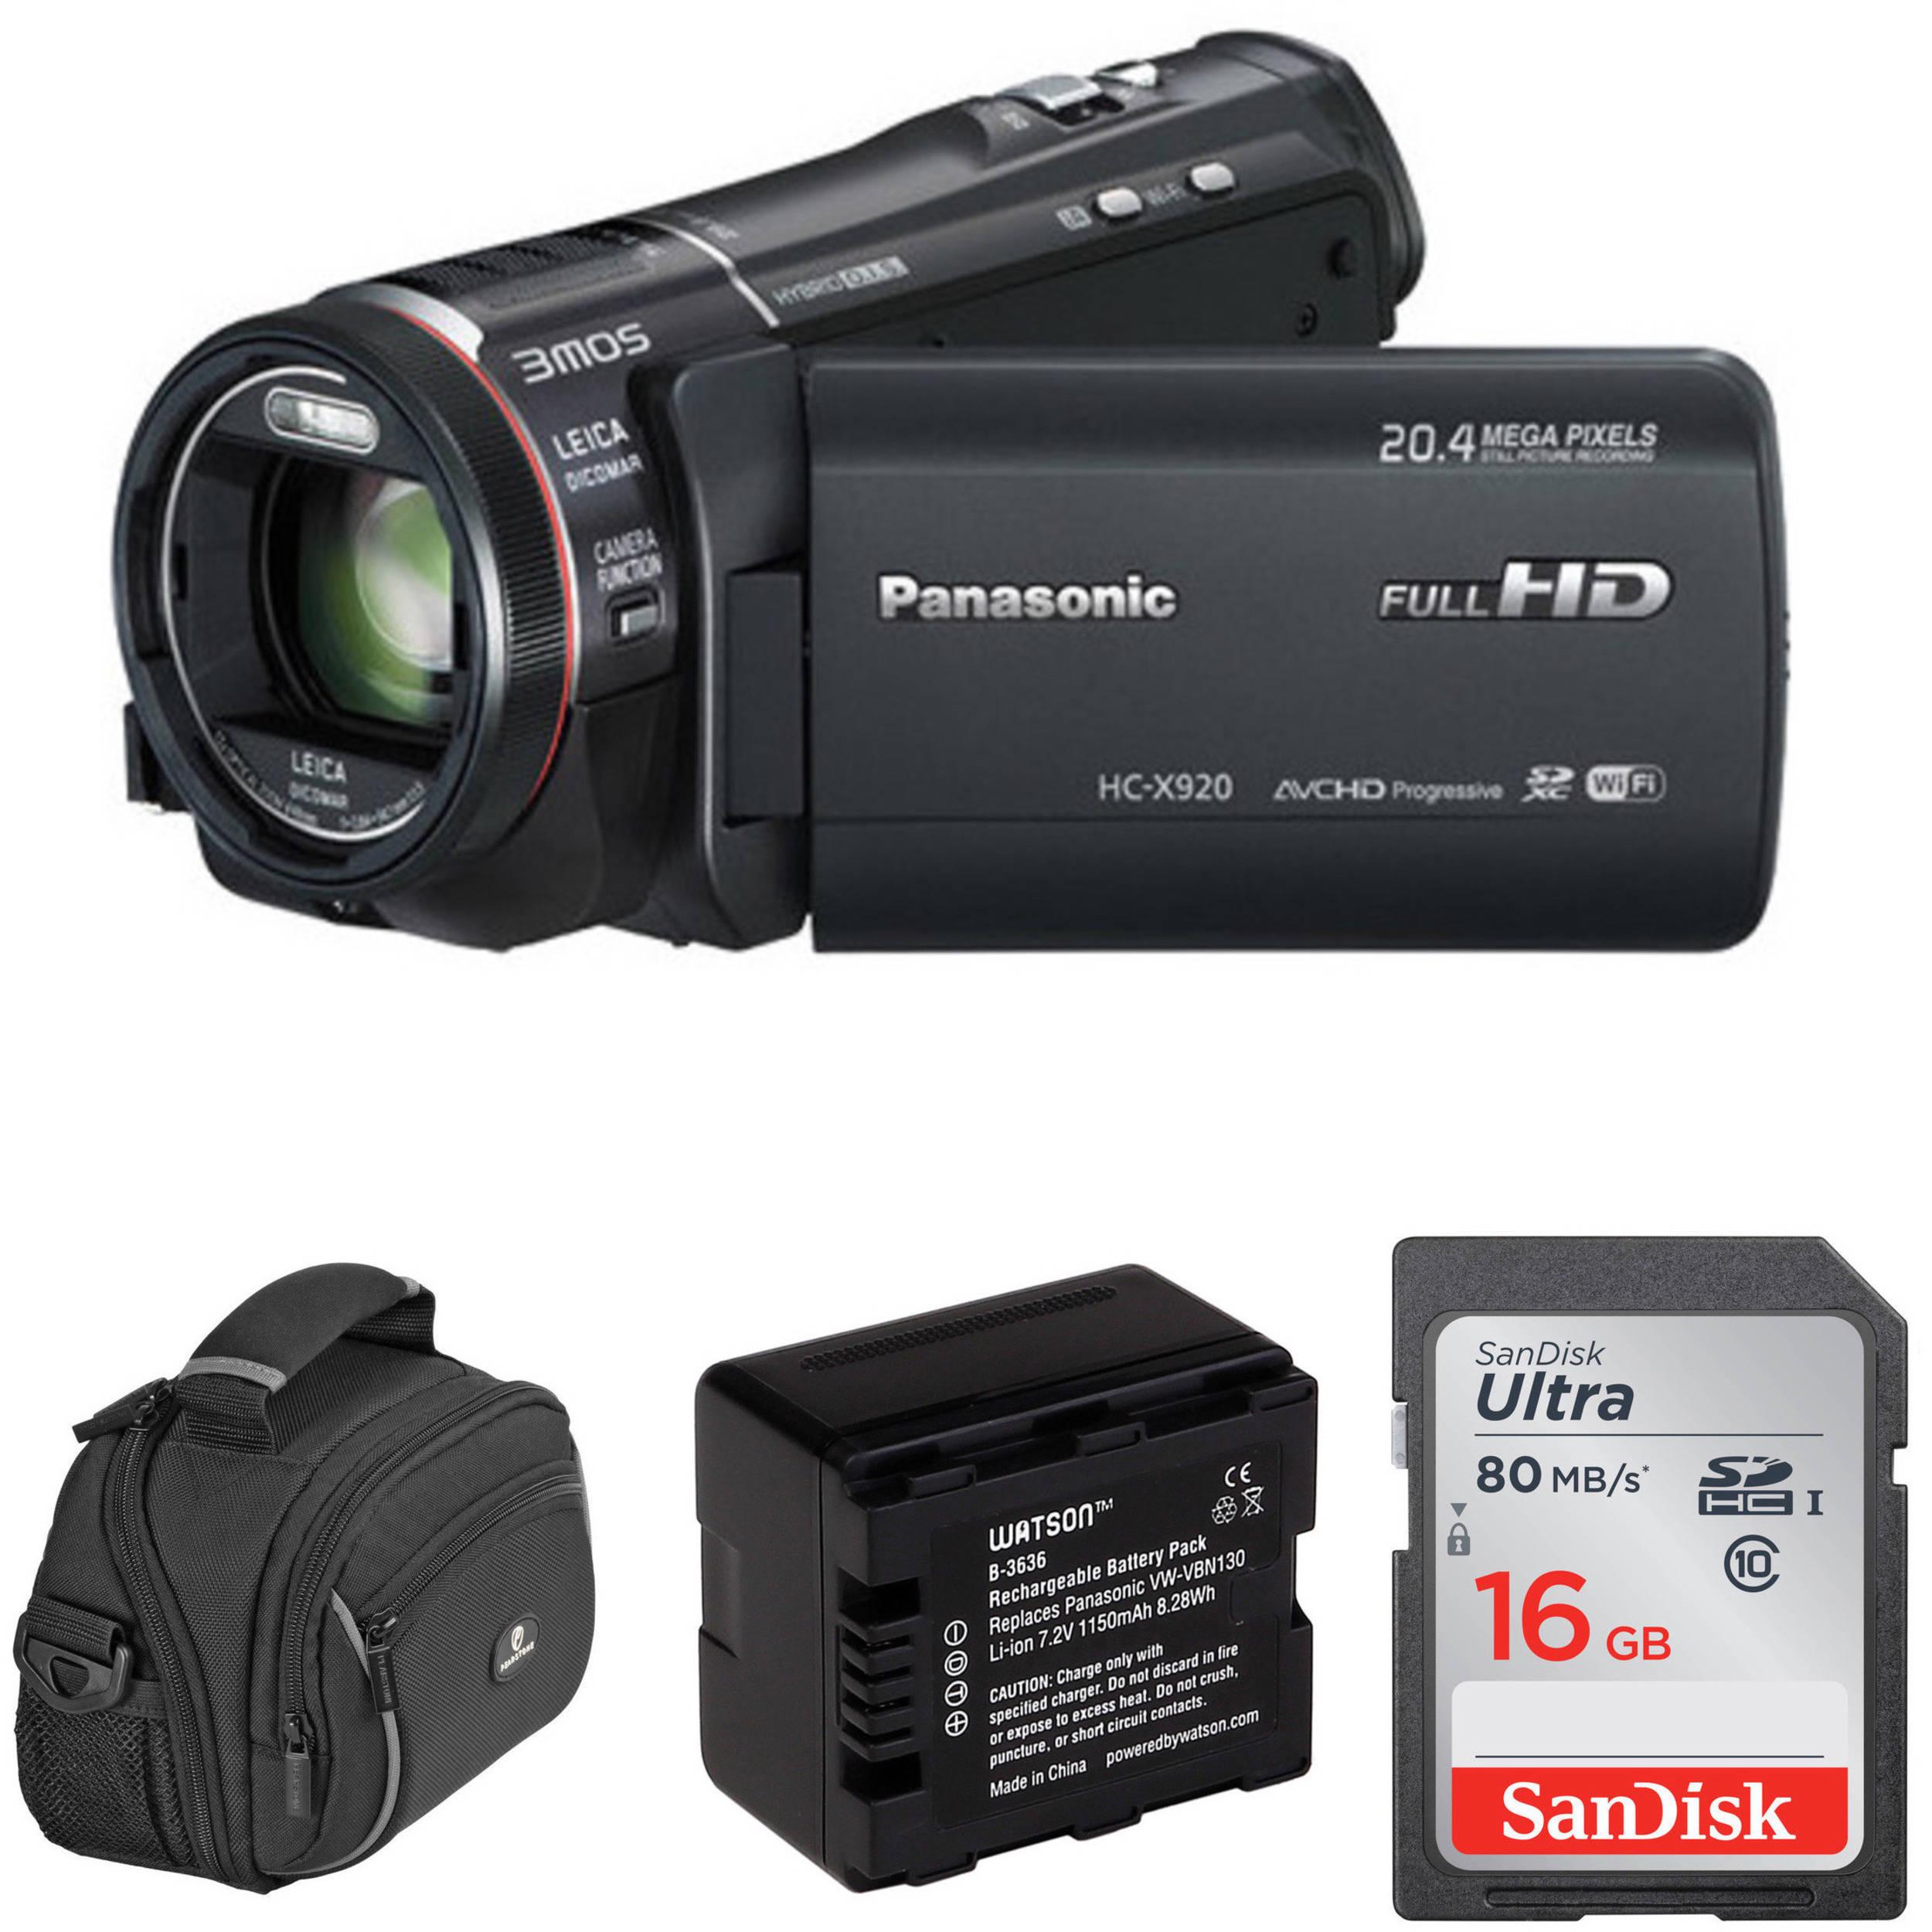 panasonic hc x920k full hd camcorder basic kit b h photo video. Black Bedroom Furniture Sets. Home Design Ideas